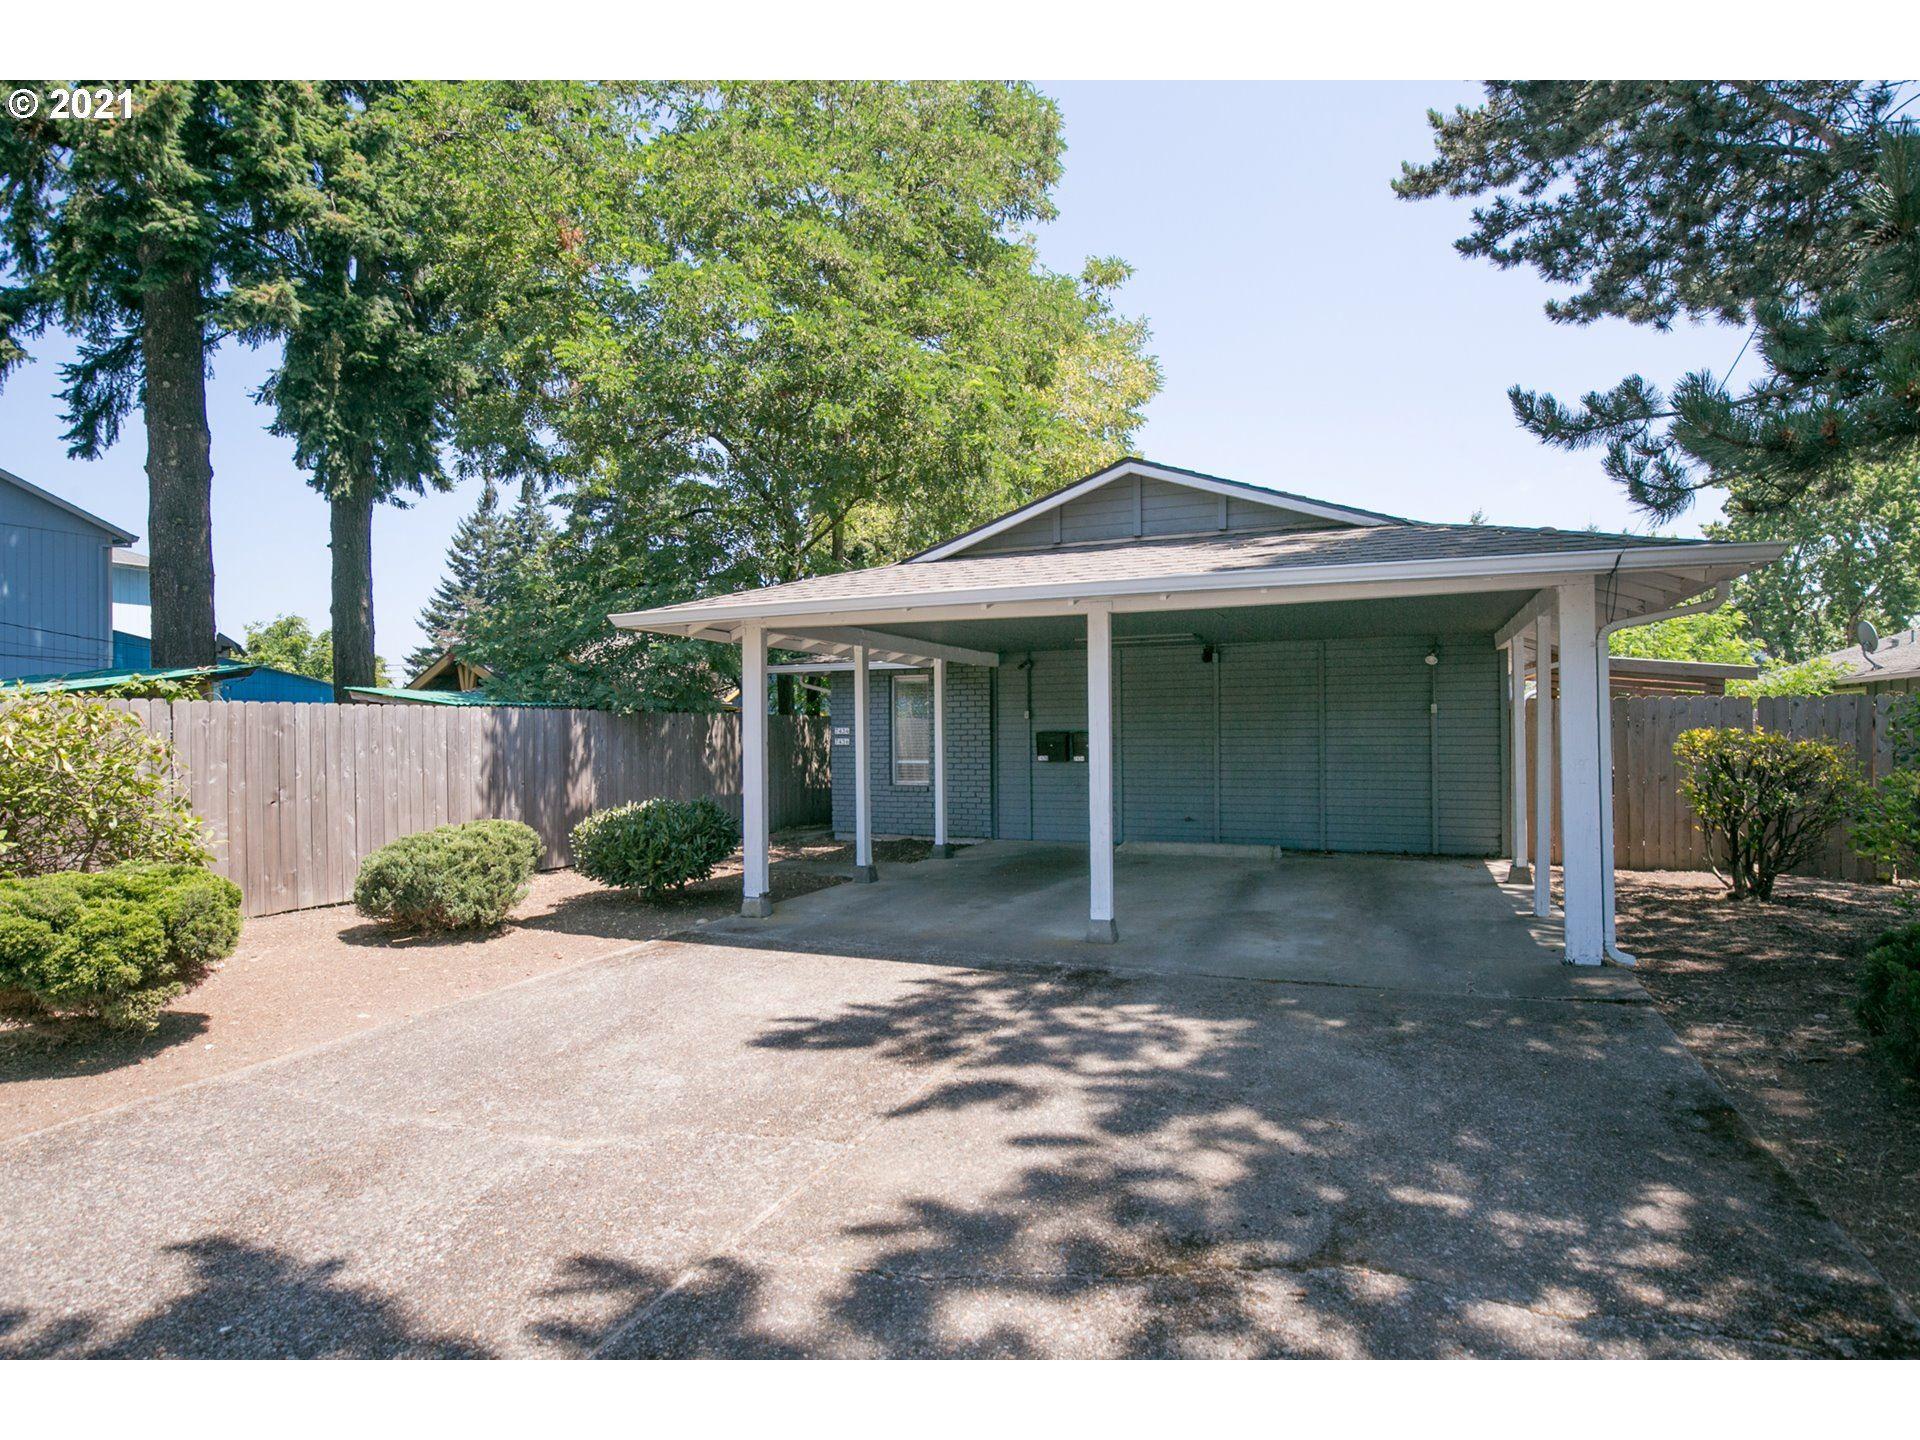 7434 SE 83RD AVE, Portland, OR 97266 - MLS#: 21159773